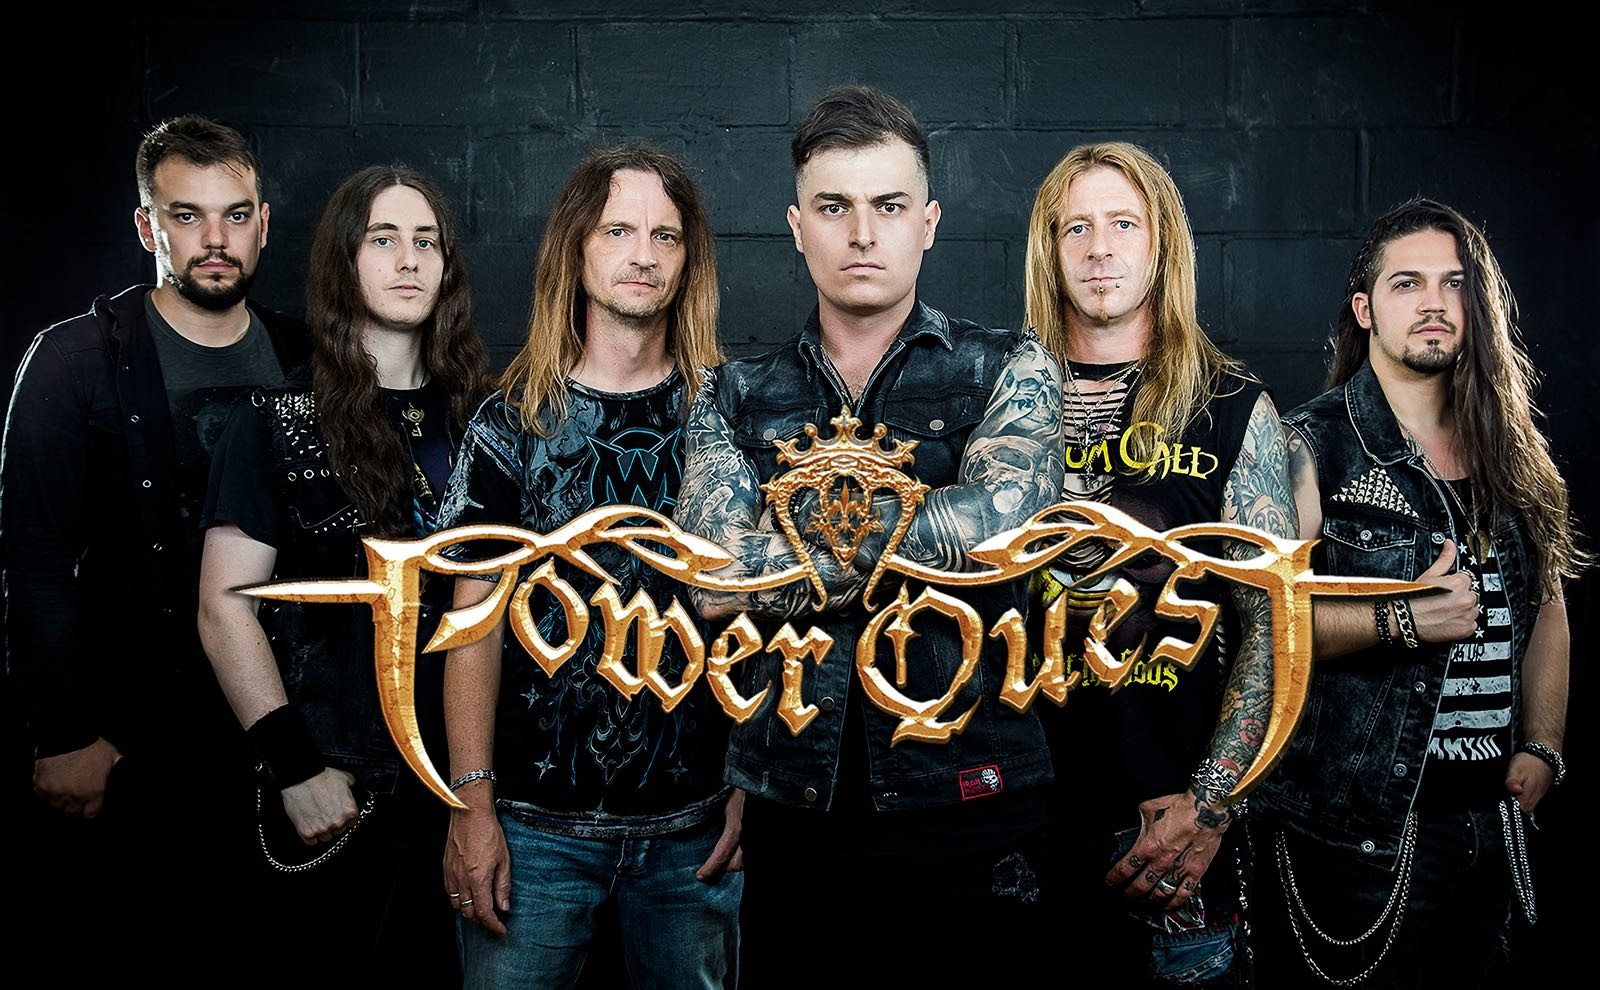 Power Quest Announce New Member